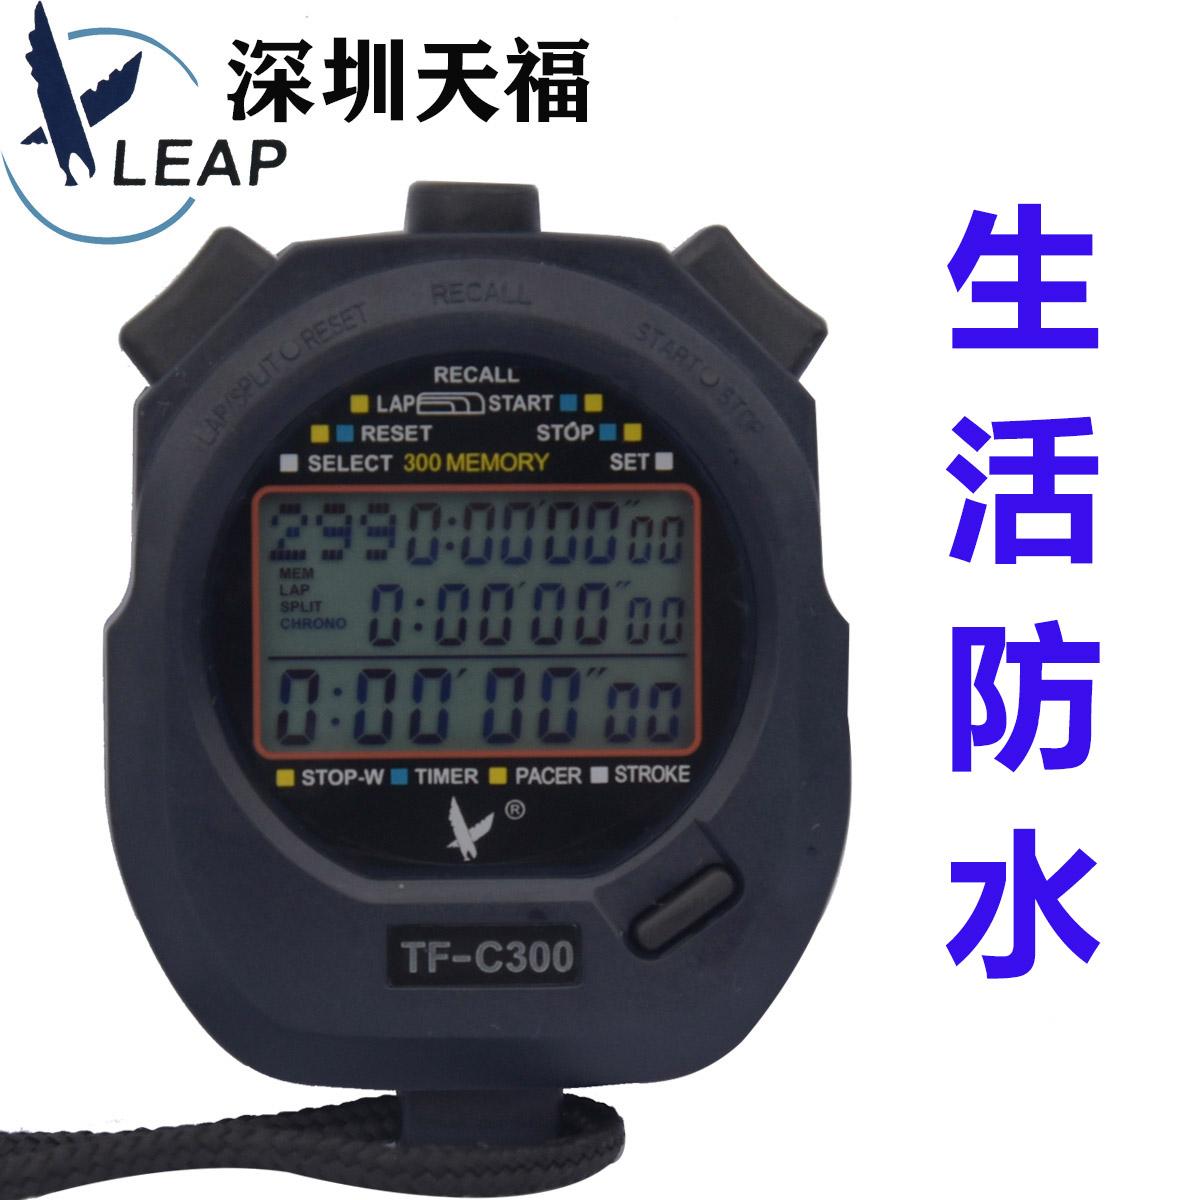 Tf-c300 memory stopwatch electronic timer swimming stopwatch waterproof paddle measurement timer.